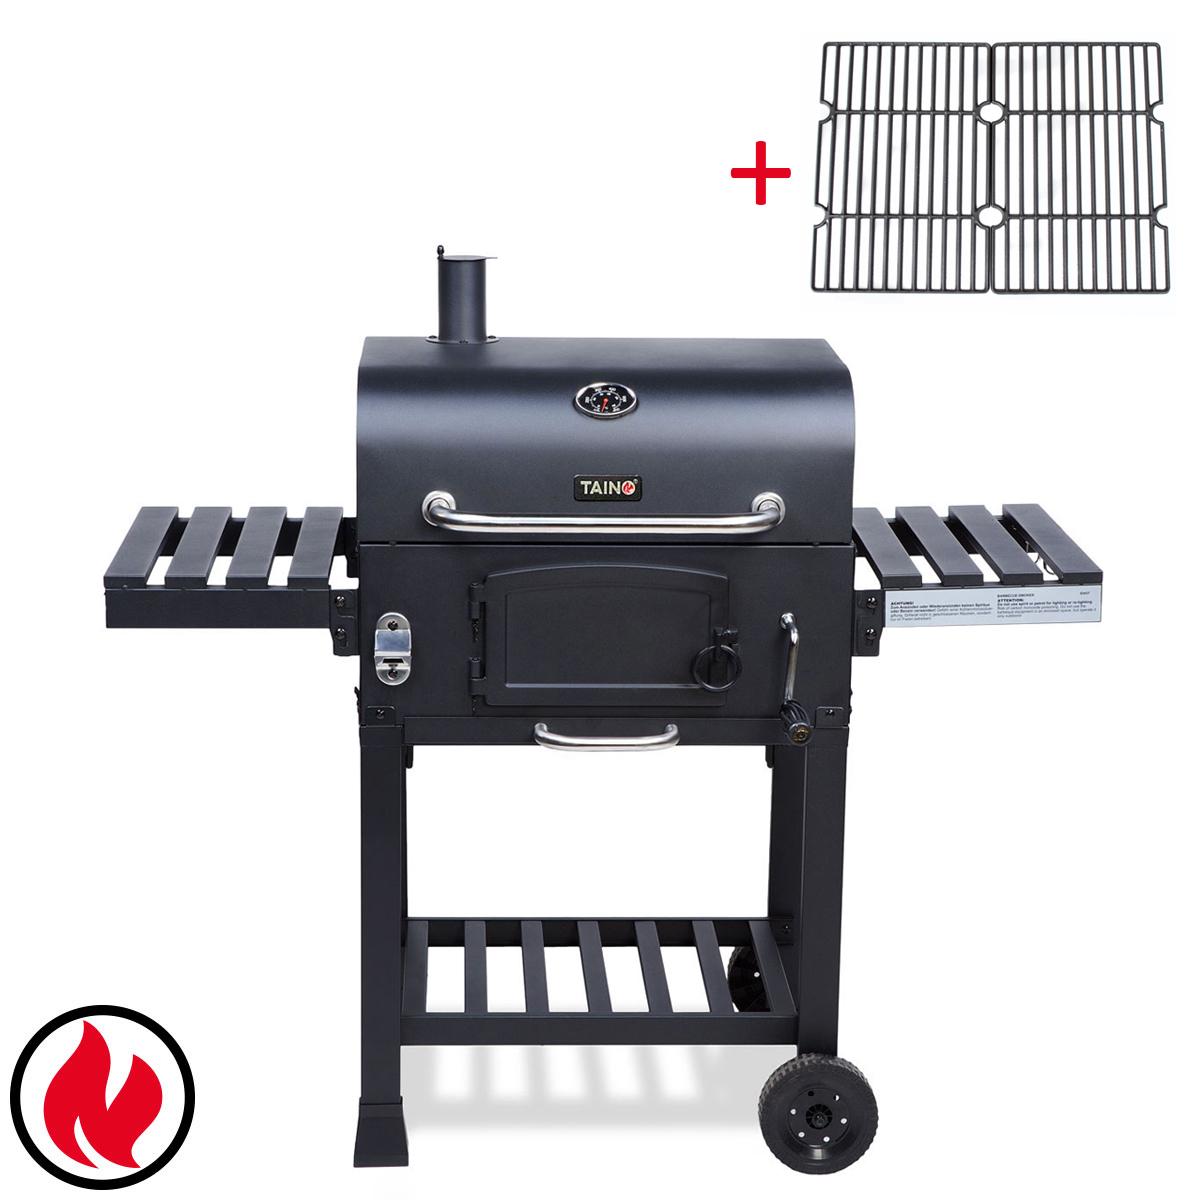 Set 93537 + 90037 (Smoker + Roste) 91037